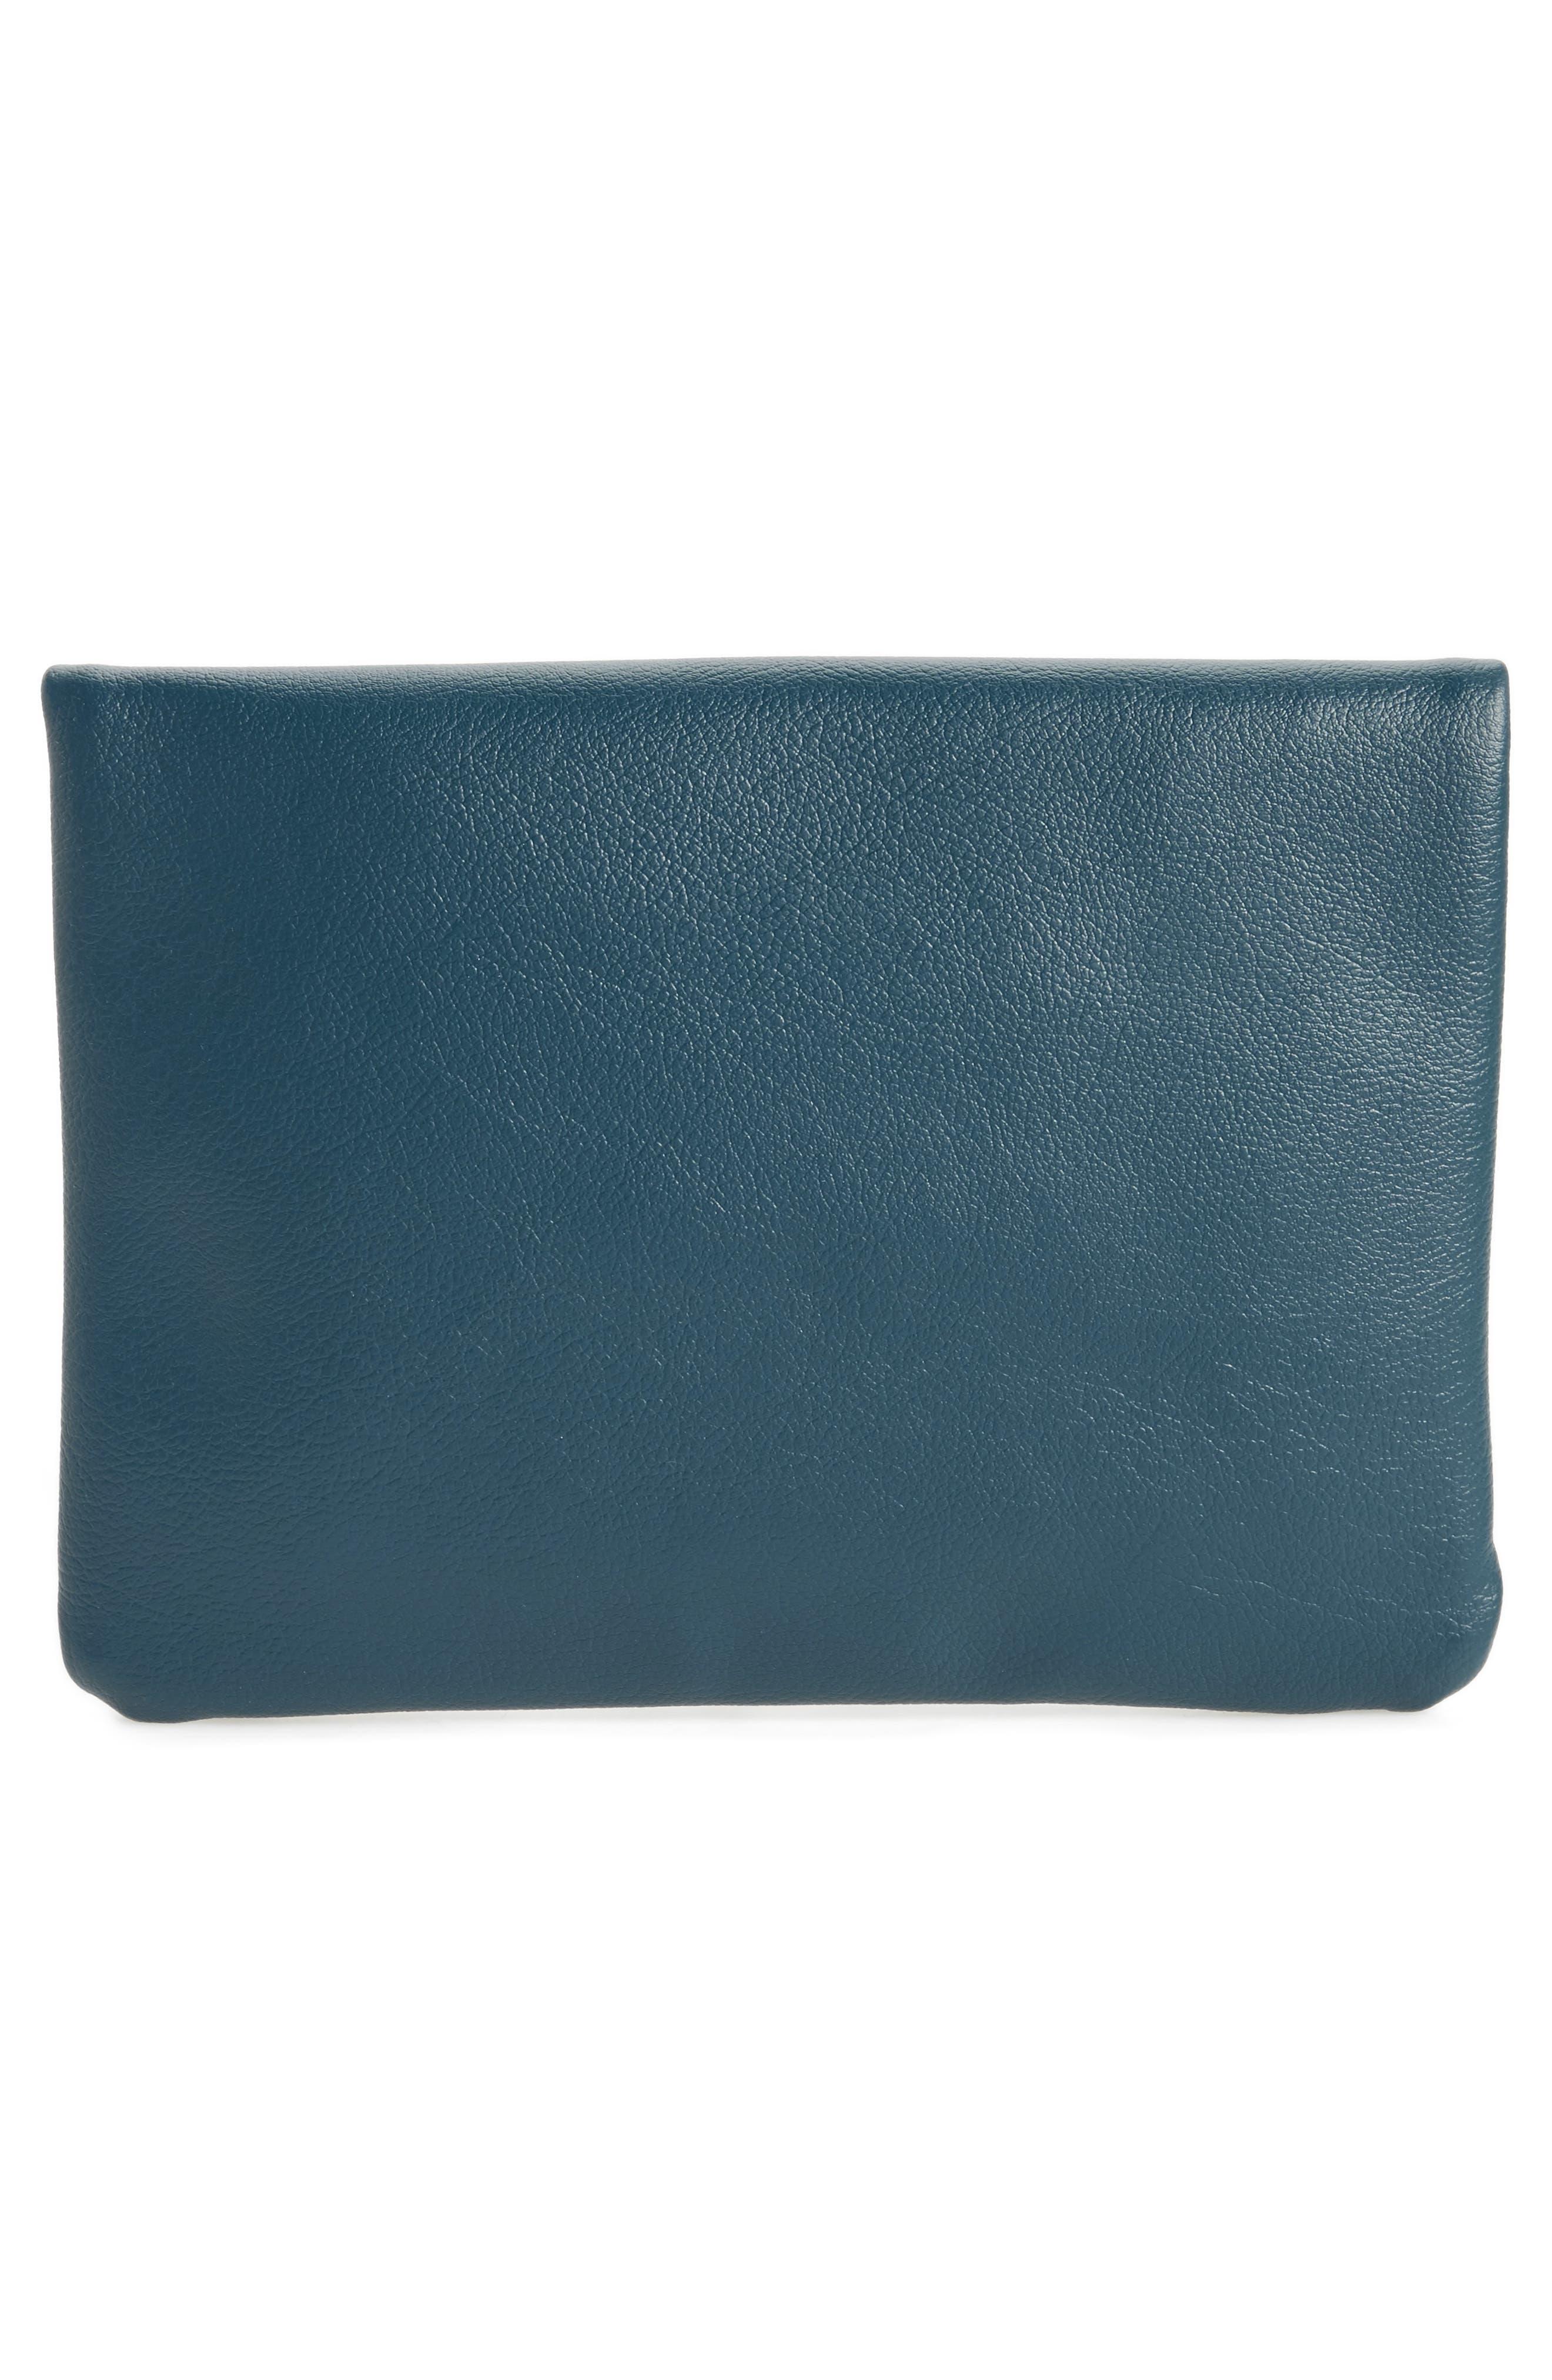 Craig Medium Faux Leather Clutch,                             Alternate thumbnail 3, color,                             Dark Blue